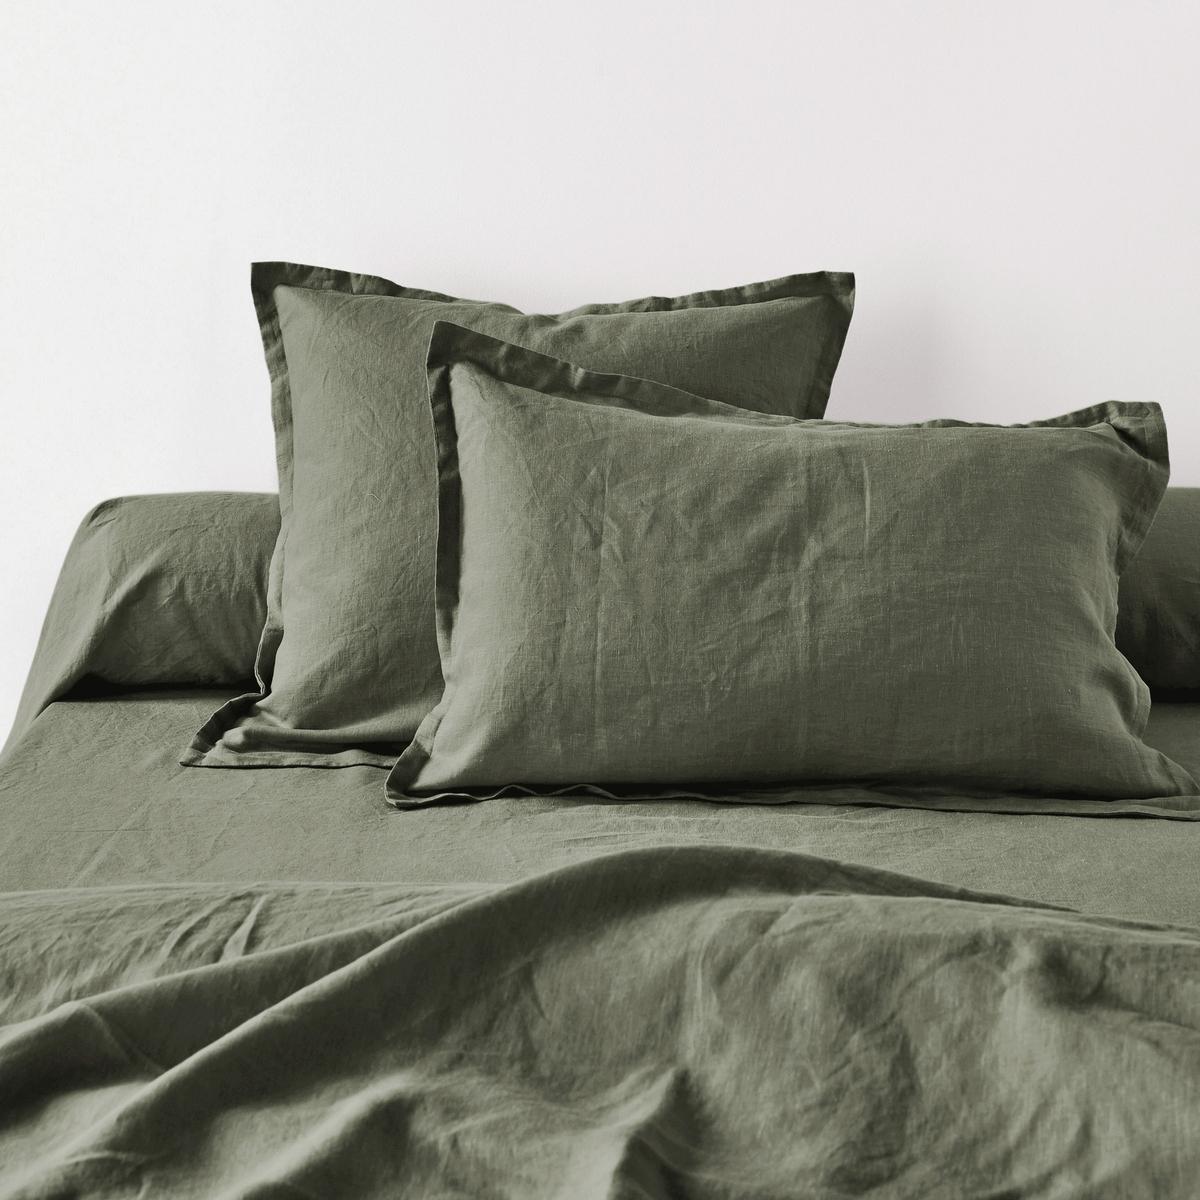 Наволочка La Redoute Или наволочка на подушку-валик из осветленного льна 85 x 185 см зеленый чехол la redoute на изголовье кровати из осветленного льна abella 90 x 85 см бежевый